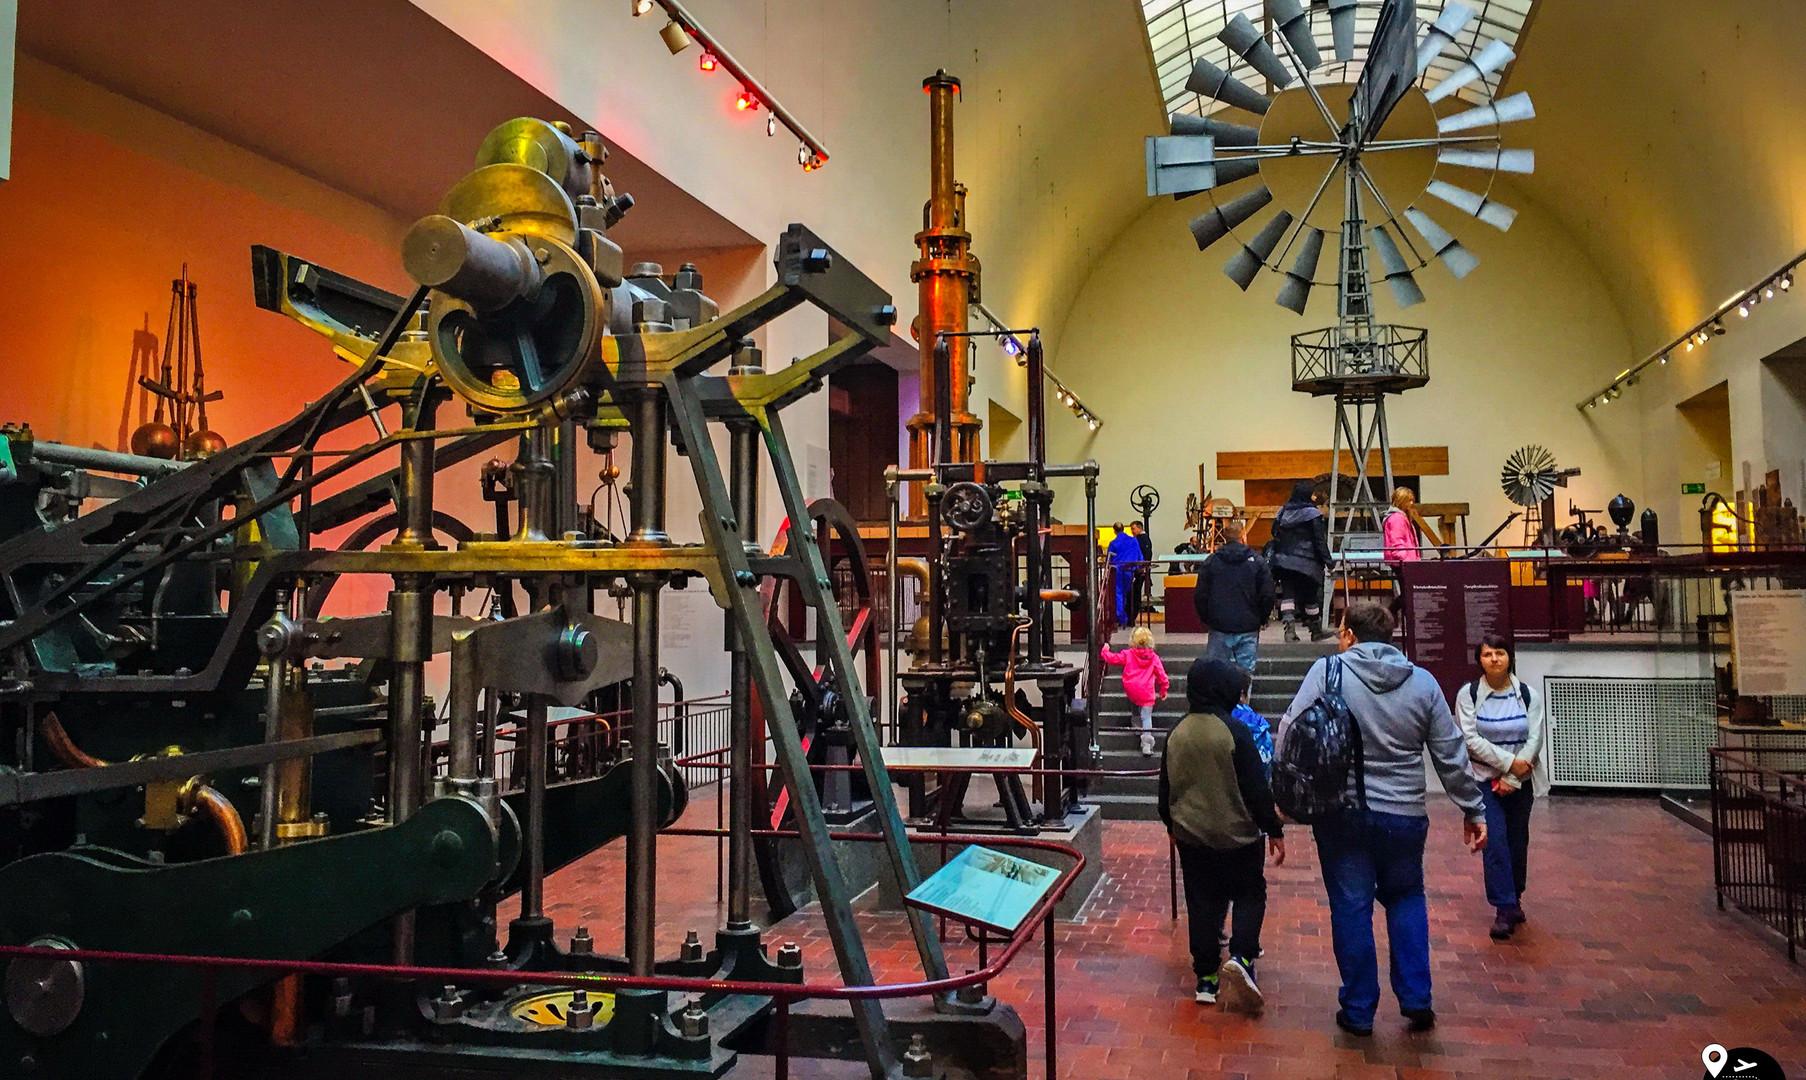 Немецкий музей техники, Мюнхен